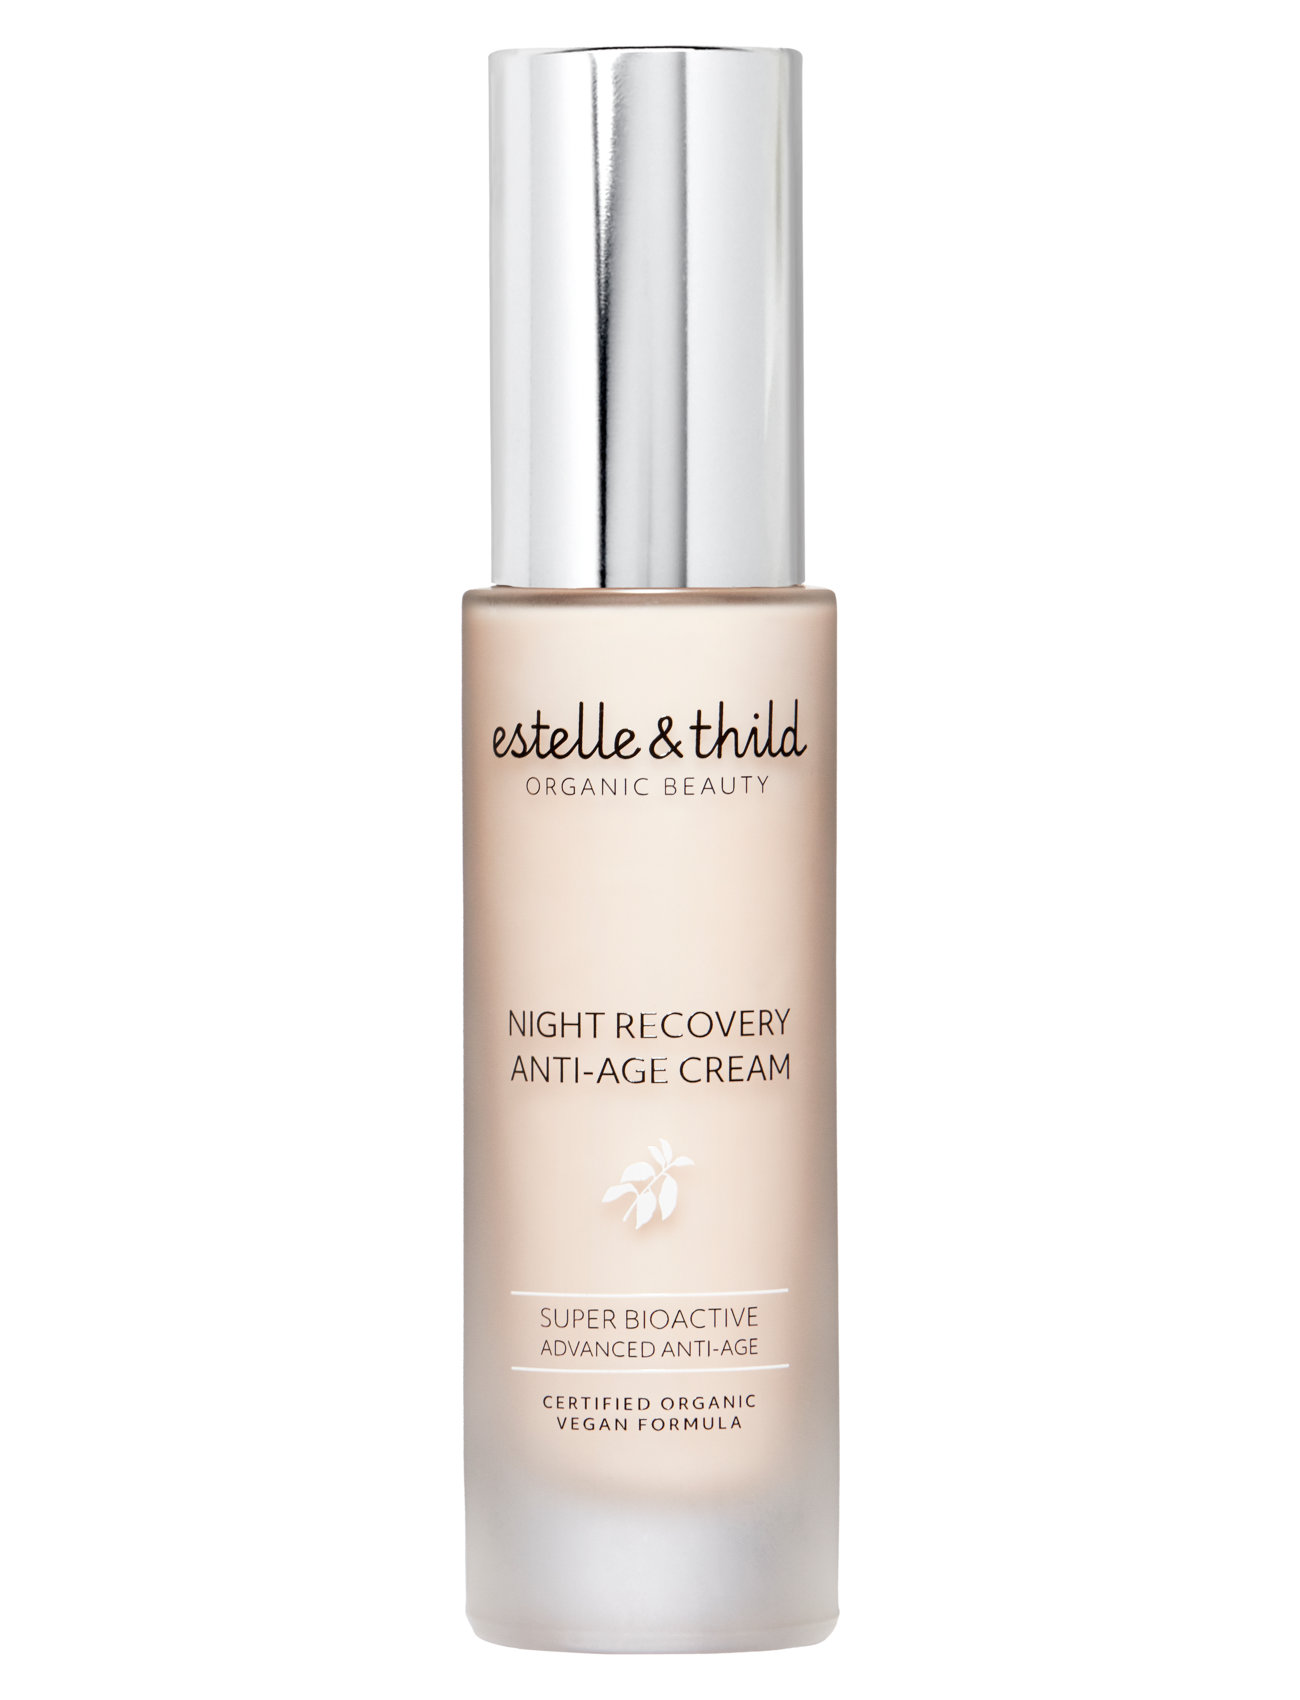 Super Bioactive Night Recovery Anti-Age Cream - Estelle & Thild